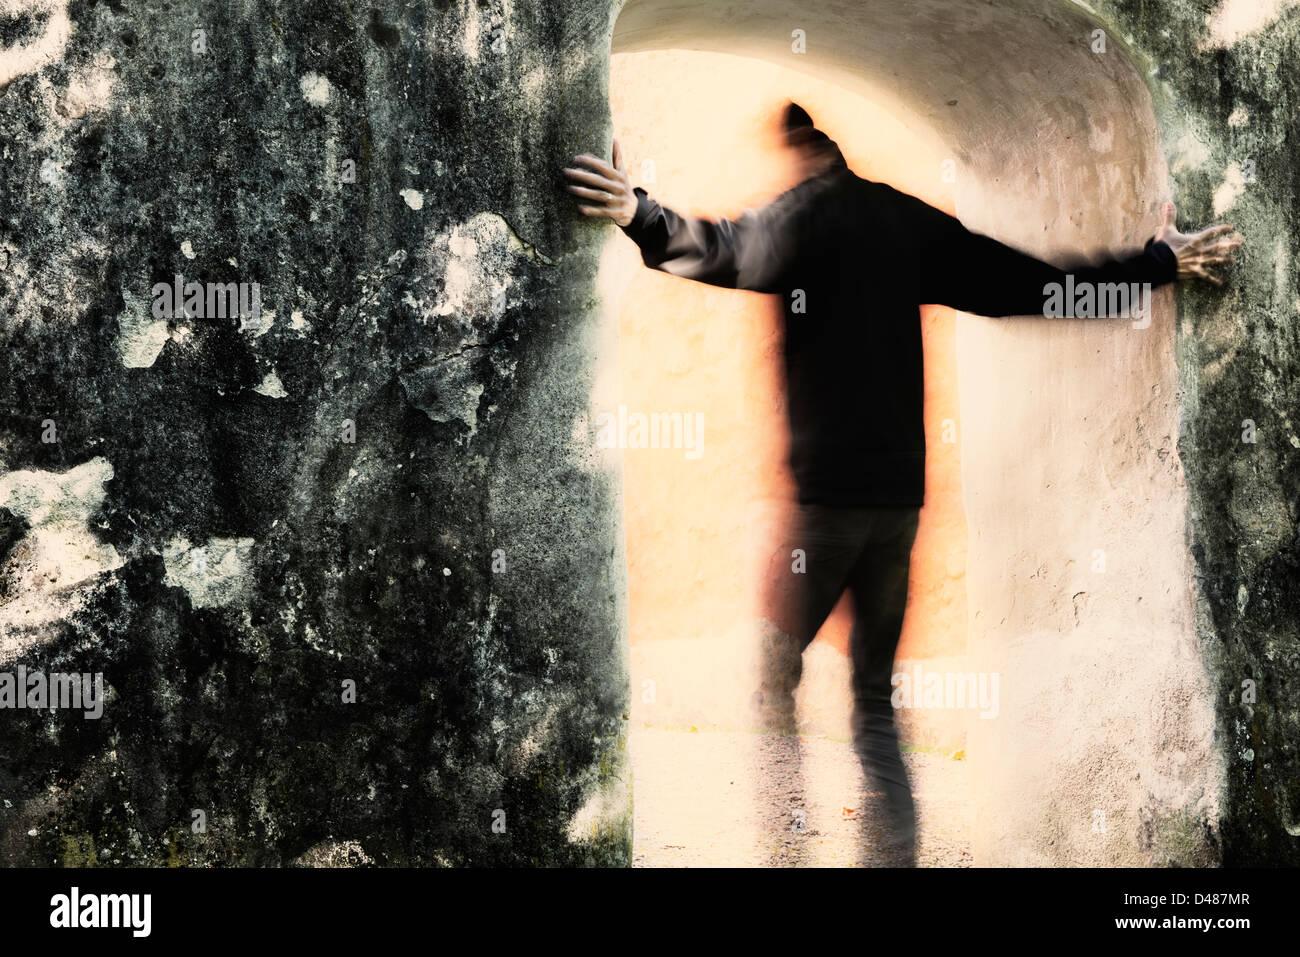 Männchen aus der Dunkelheit ins Licht durch Portal bewegen. Er hält an der Steinmauer. Stockbild